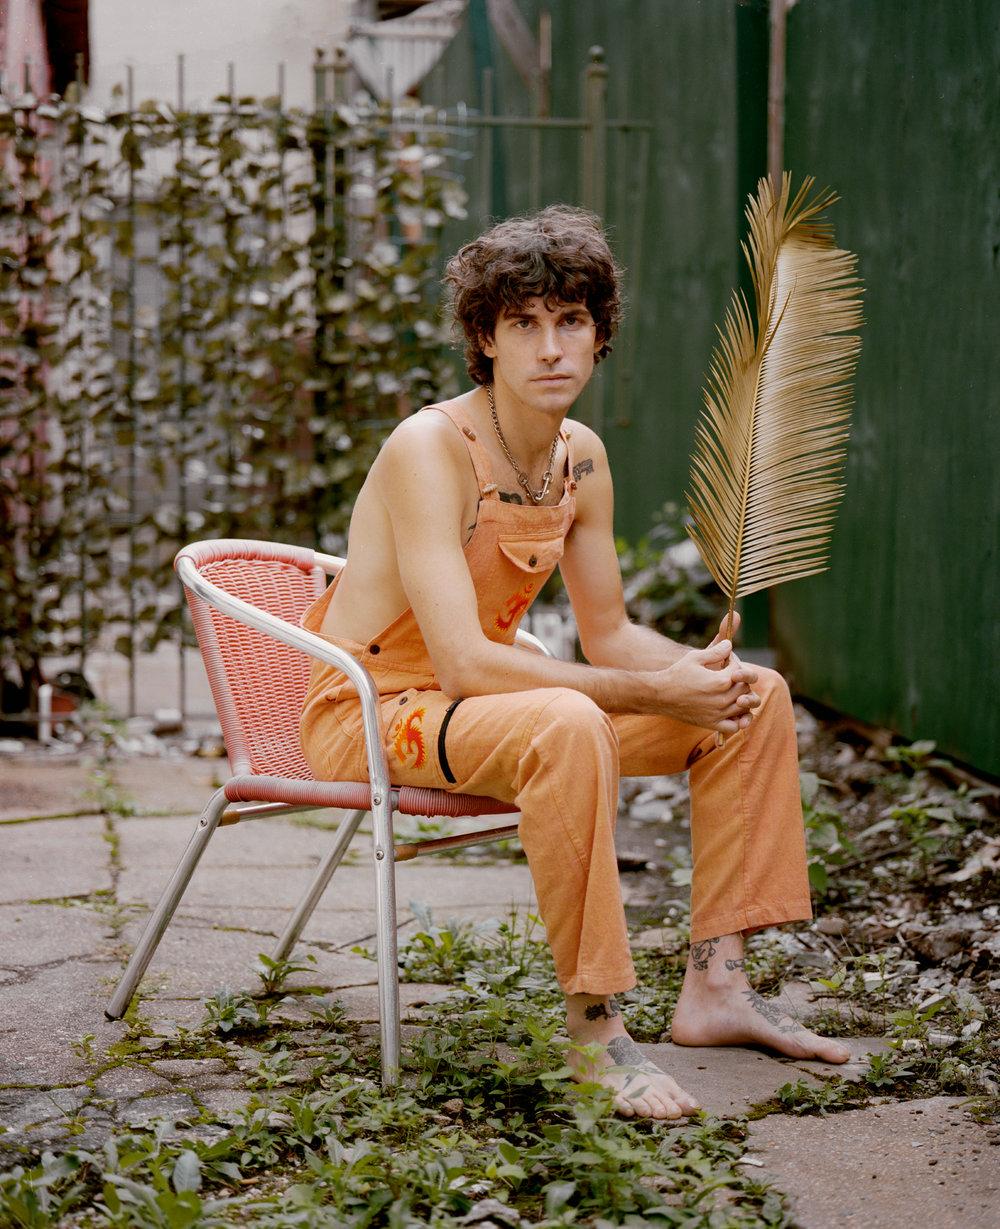 Performer Jazzboy  Stylist Leon Hernadez